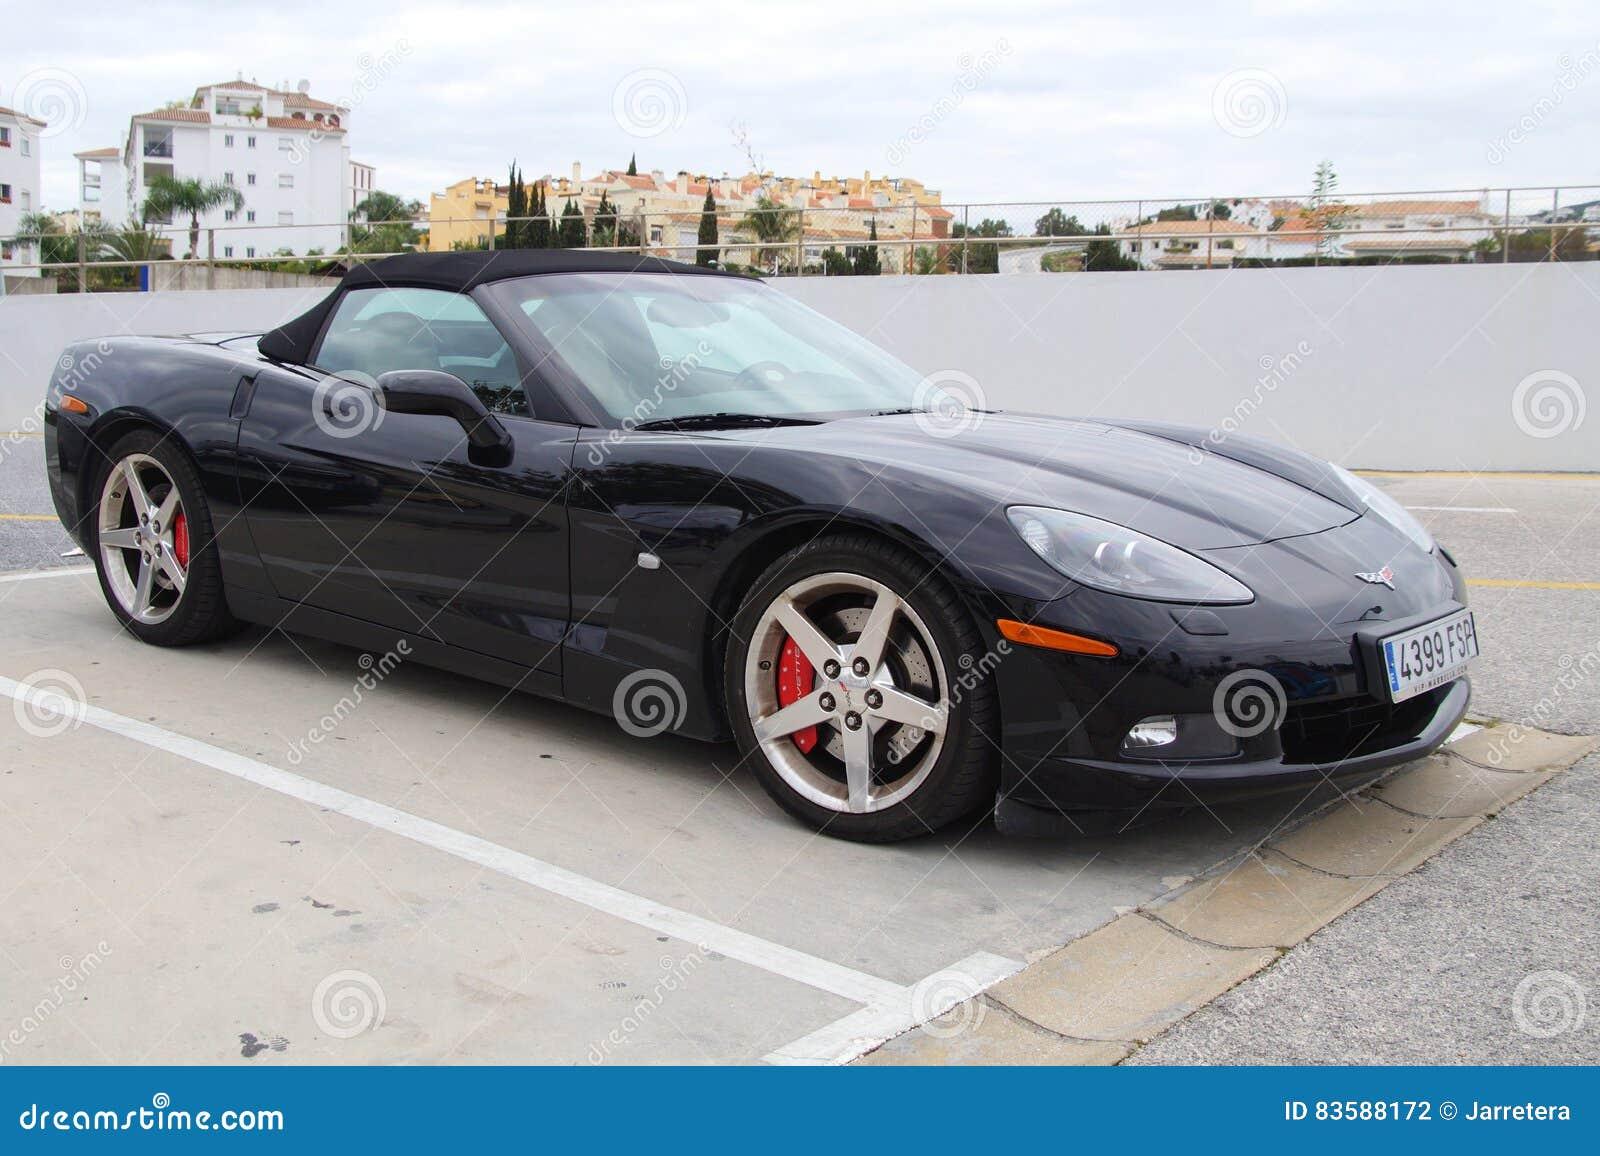 Kelebihan Chevrolet Corvette C6 Spesifikasi